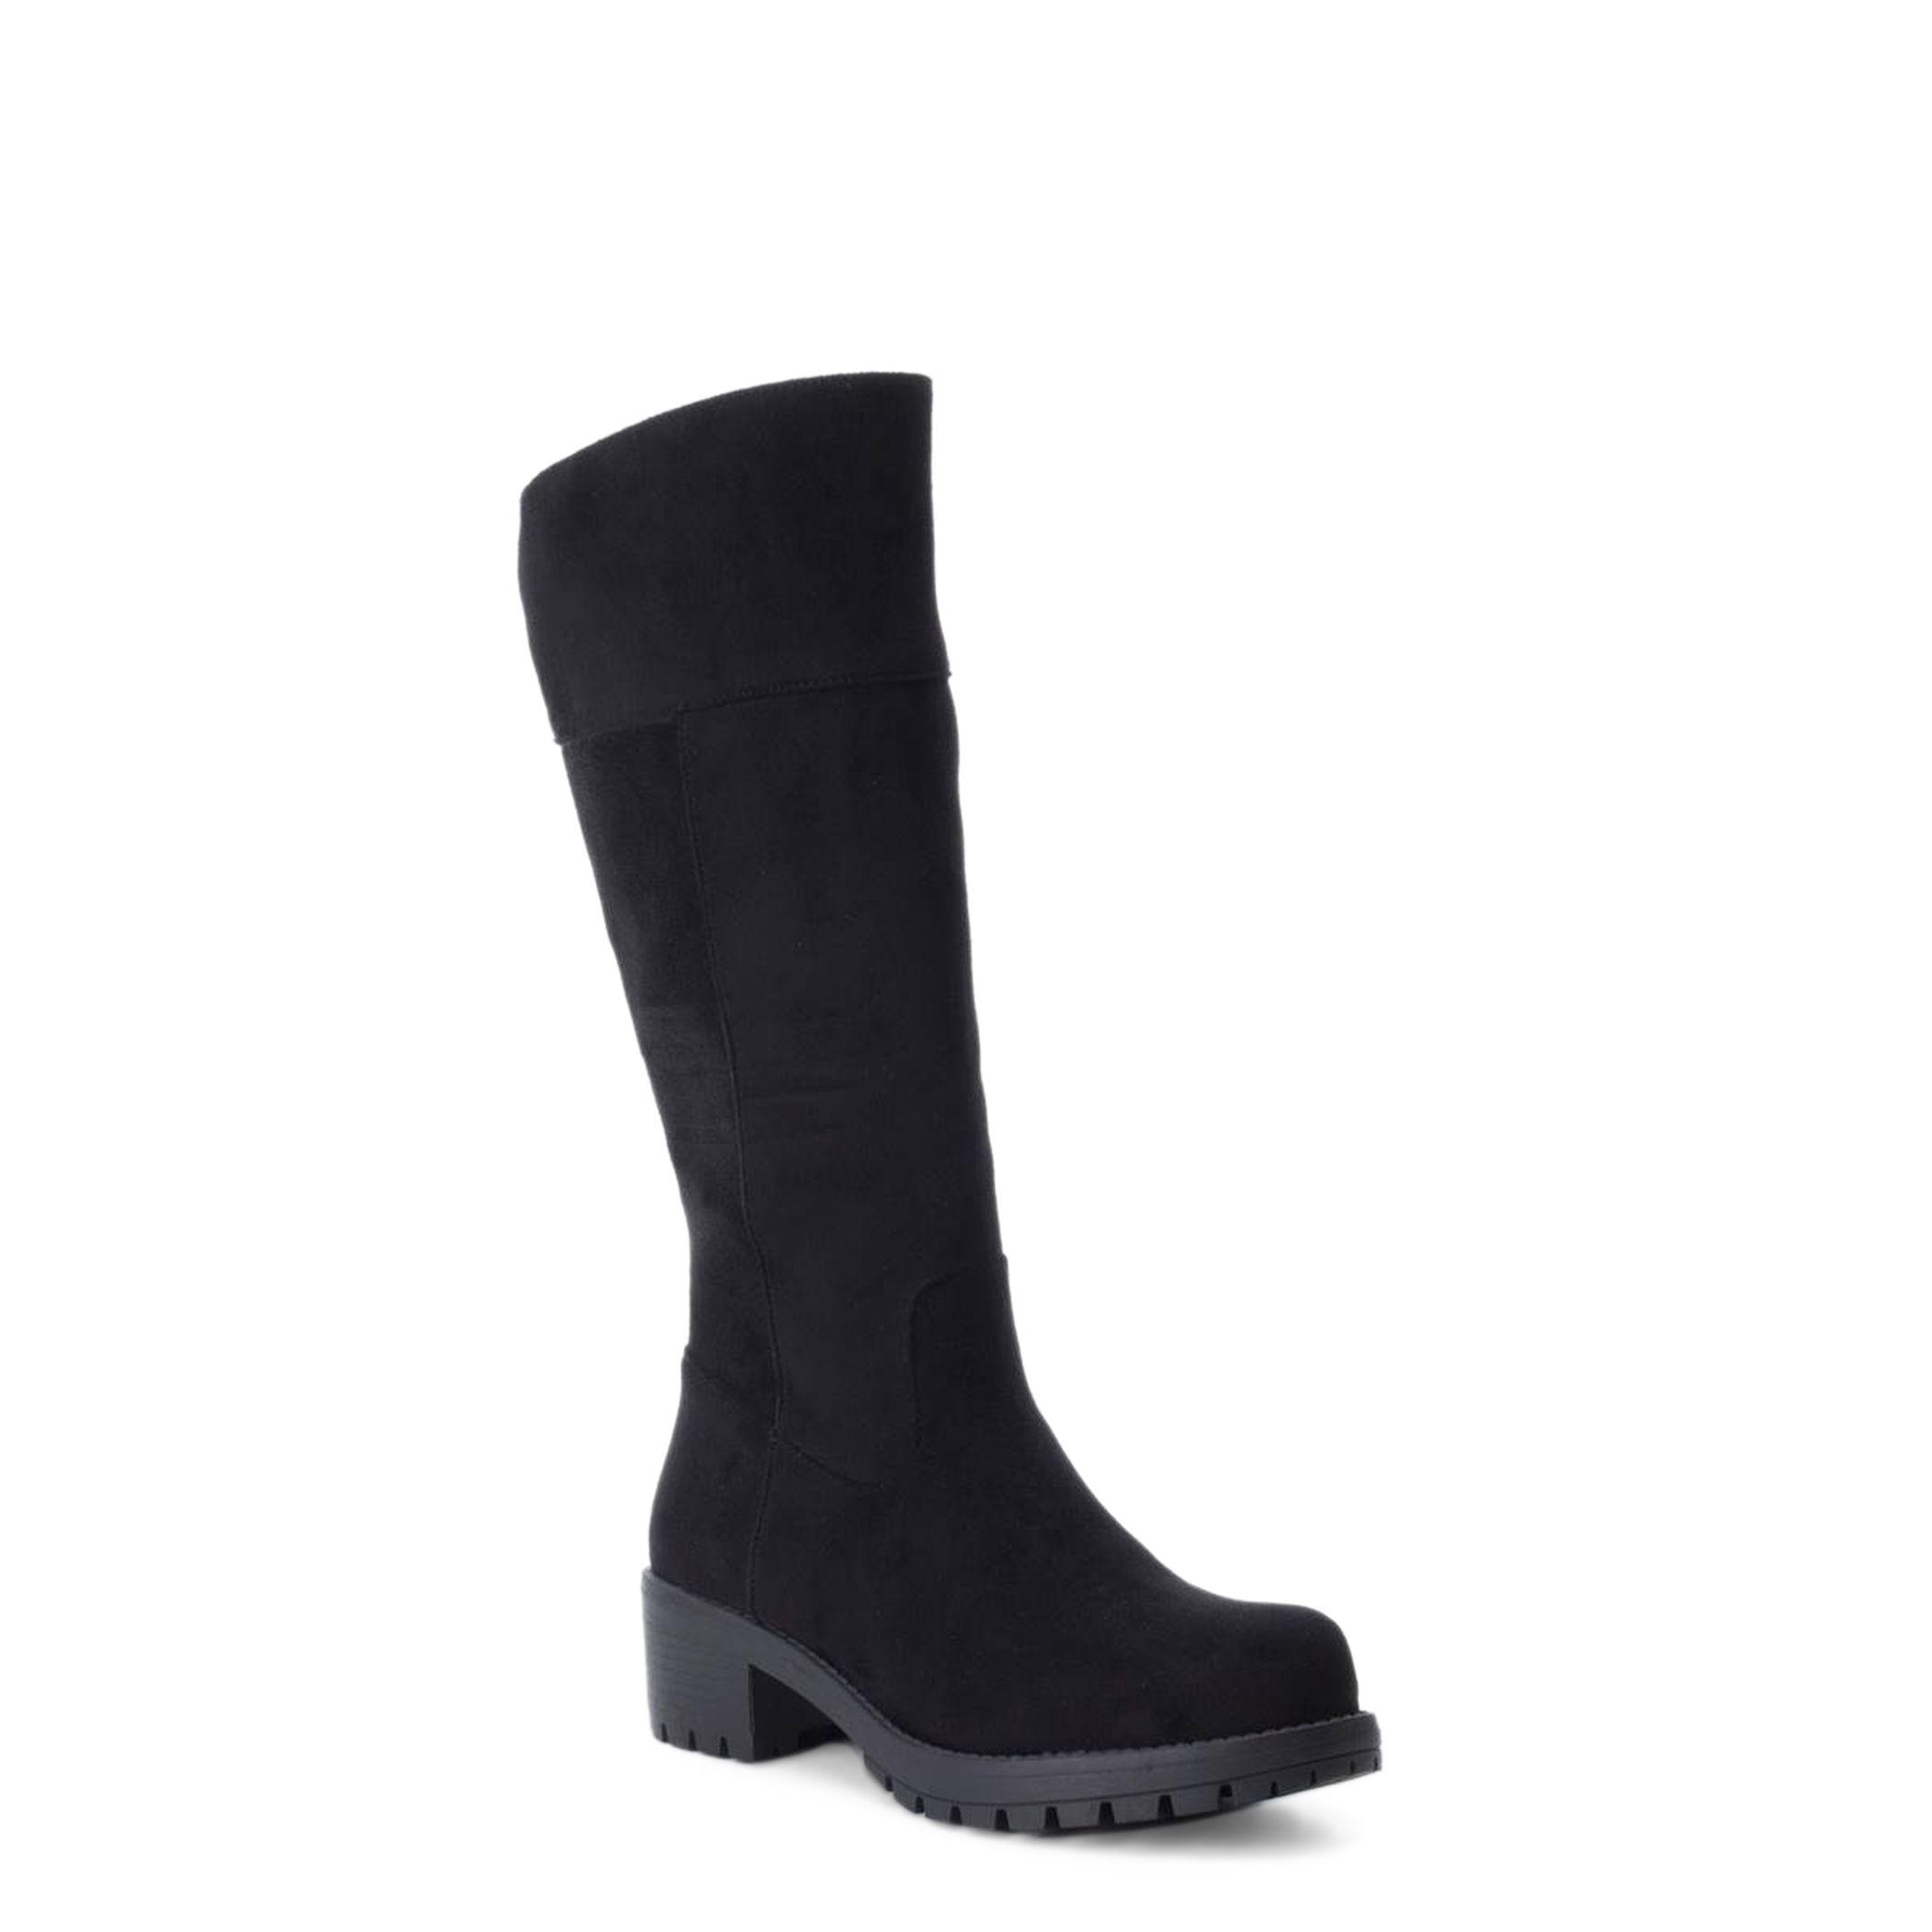 Schuhe Xti – 33979 – Schwarz